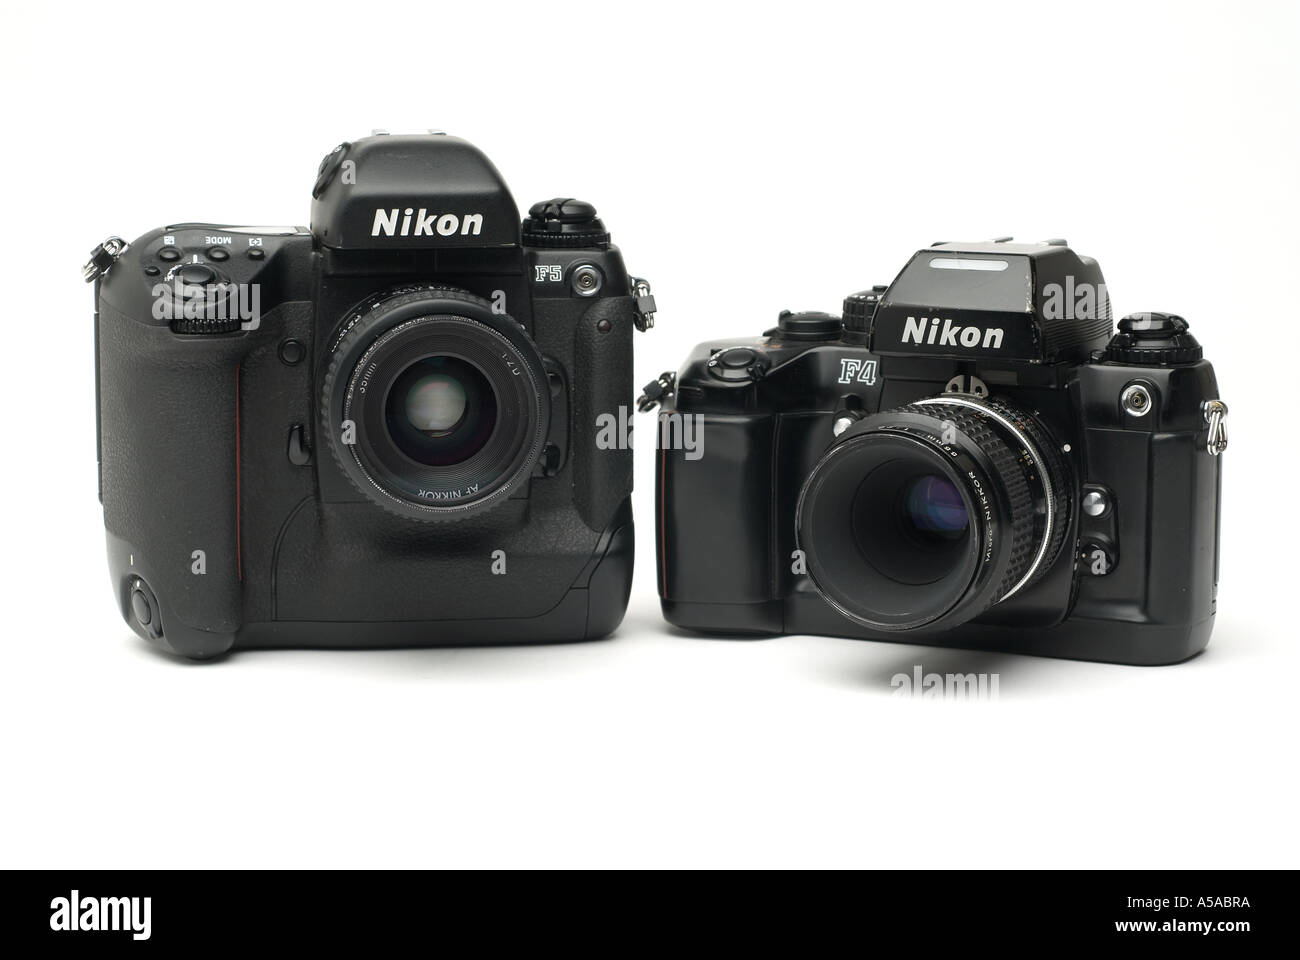 nikon f4 35mm film camera stock photos nikon f4 35mm film camera rh alamy com Nikon F4 Viewfinder Display Nikon F6